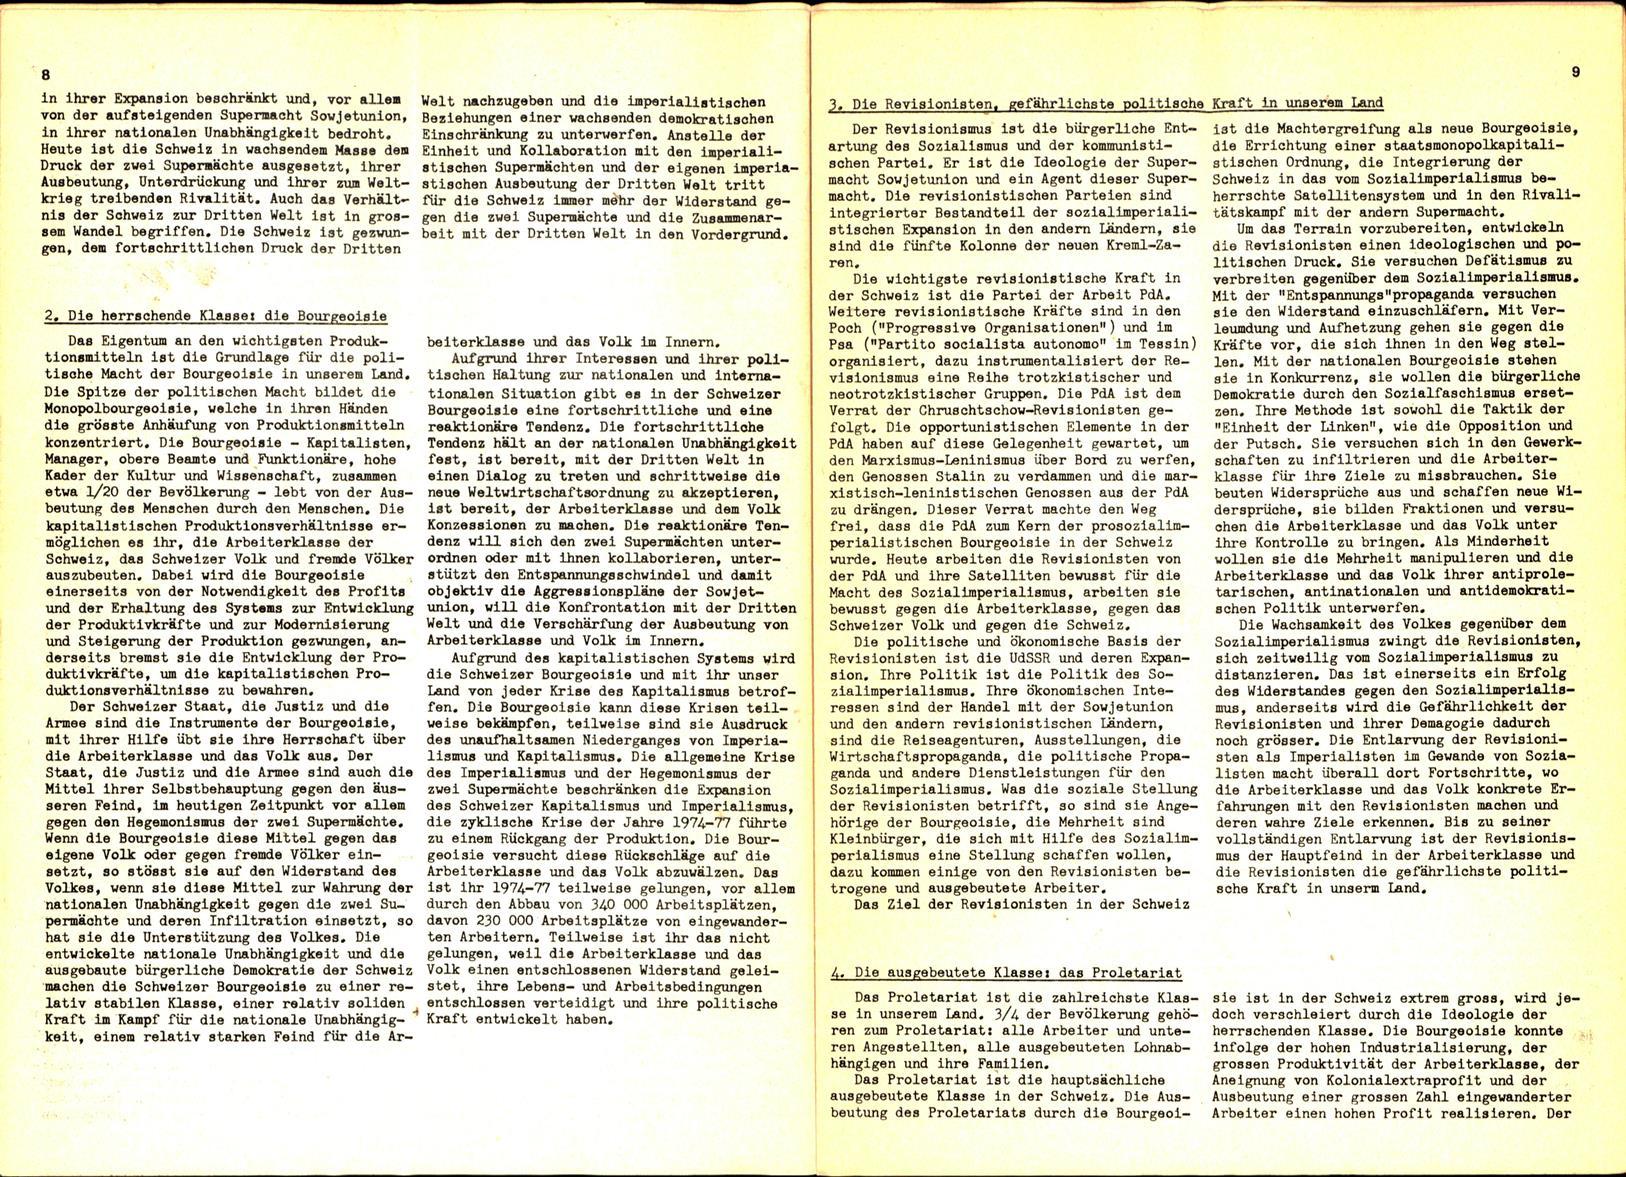 Schweiz_KPSML_Oktober_19780100_118_005